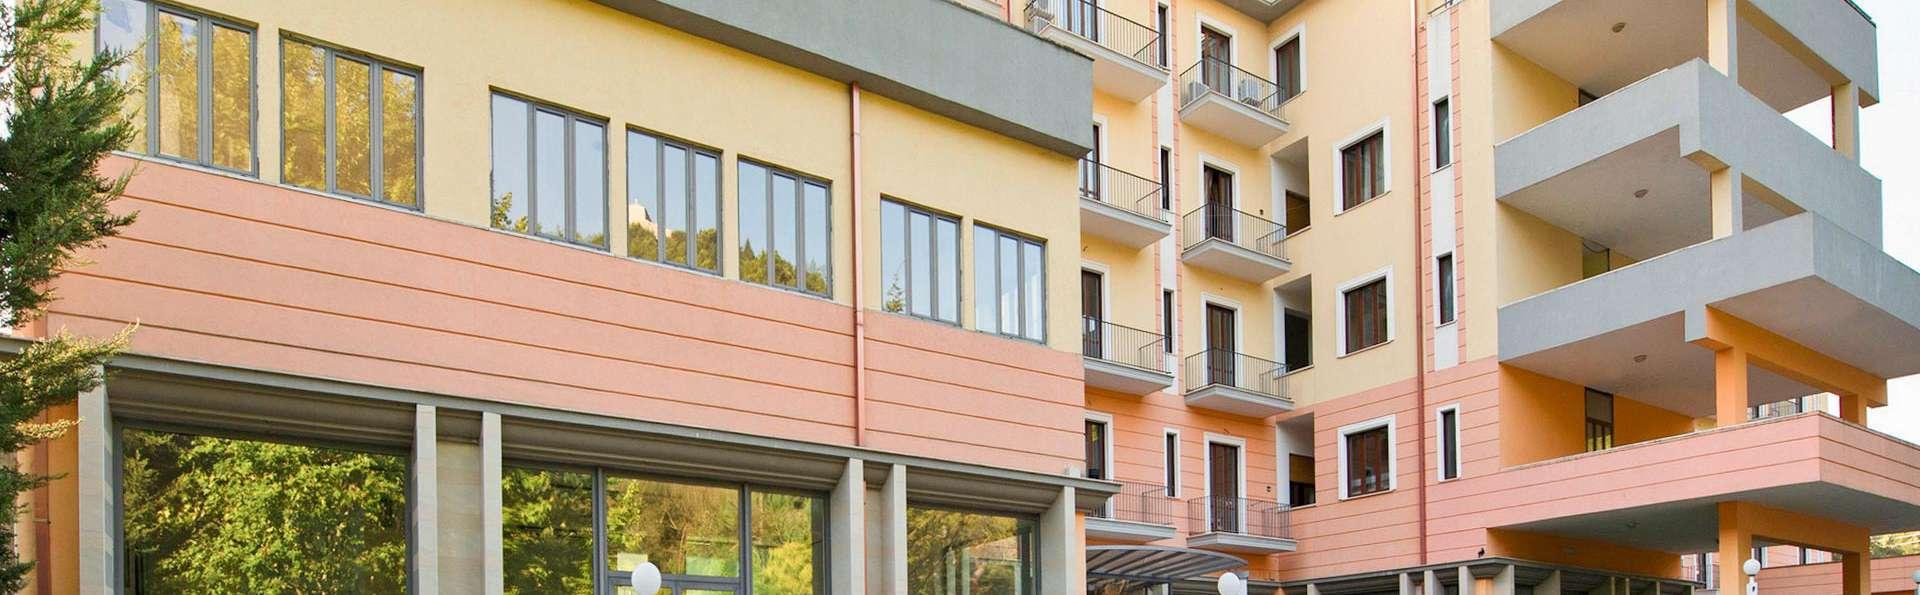 Hotel Terme Forlenza - EDIT_FRONT_01.jpg